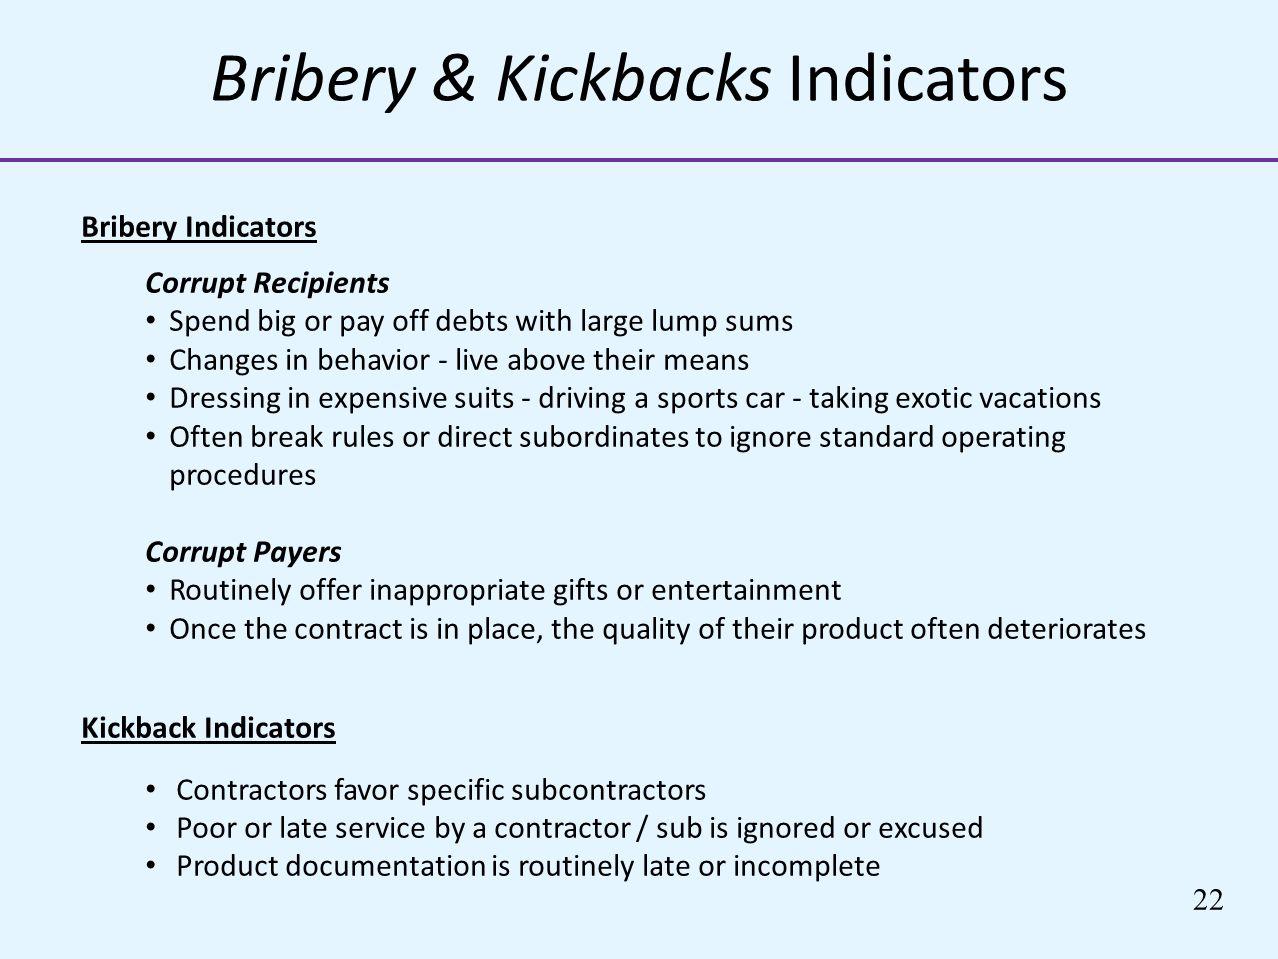 Bribery & Kickbacks Indicators Bribery Indicators Corrupt Recipients Spend big or pay off debts with large lump sums Changes in behavior - live above